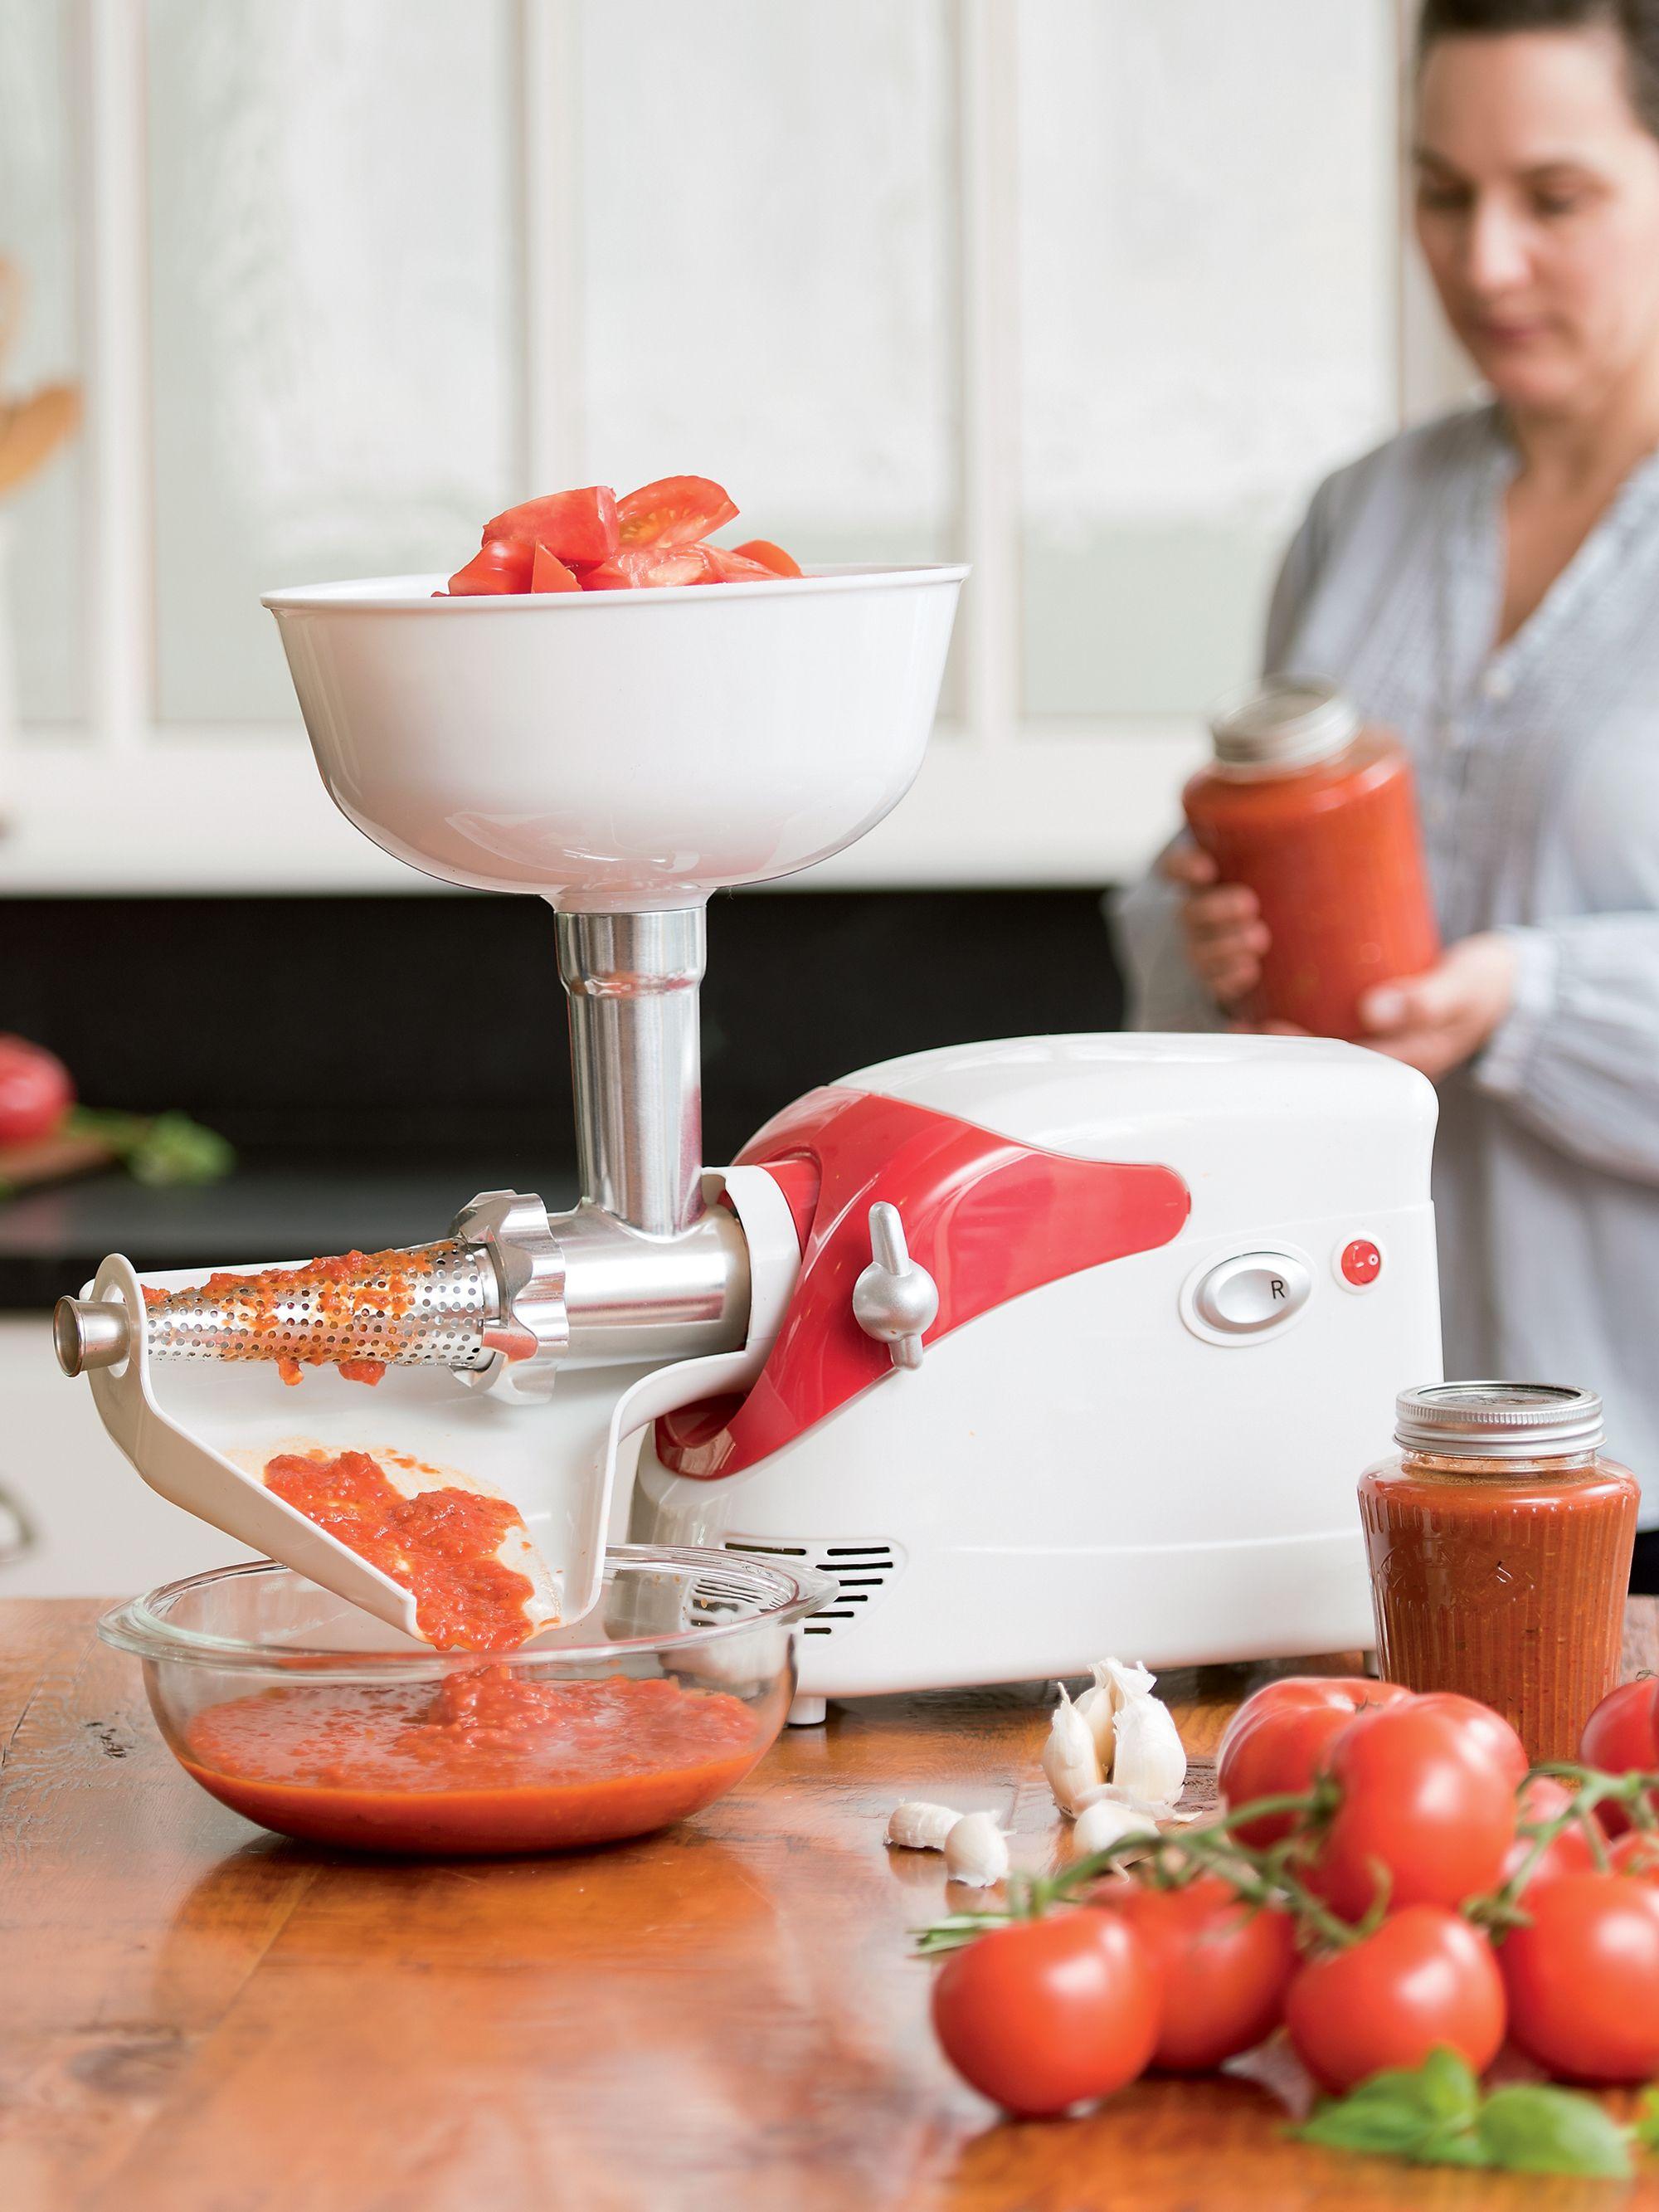 Deluxe electric tomato strainer 200 watt